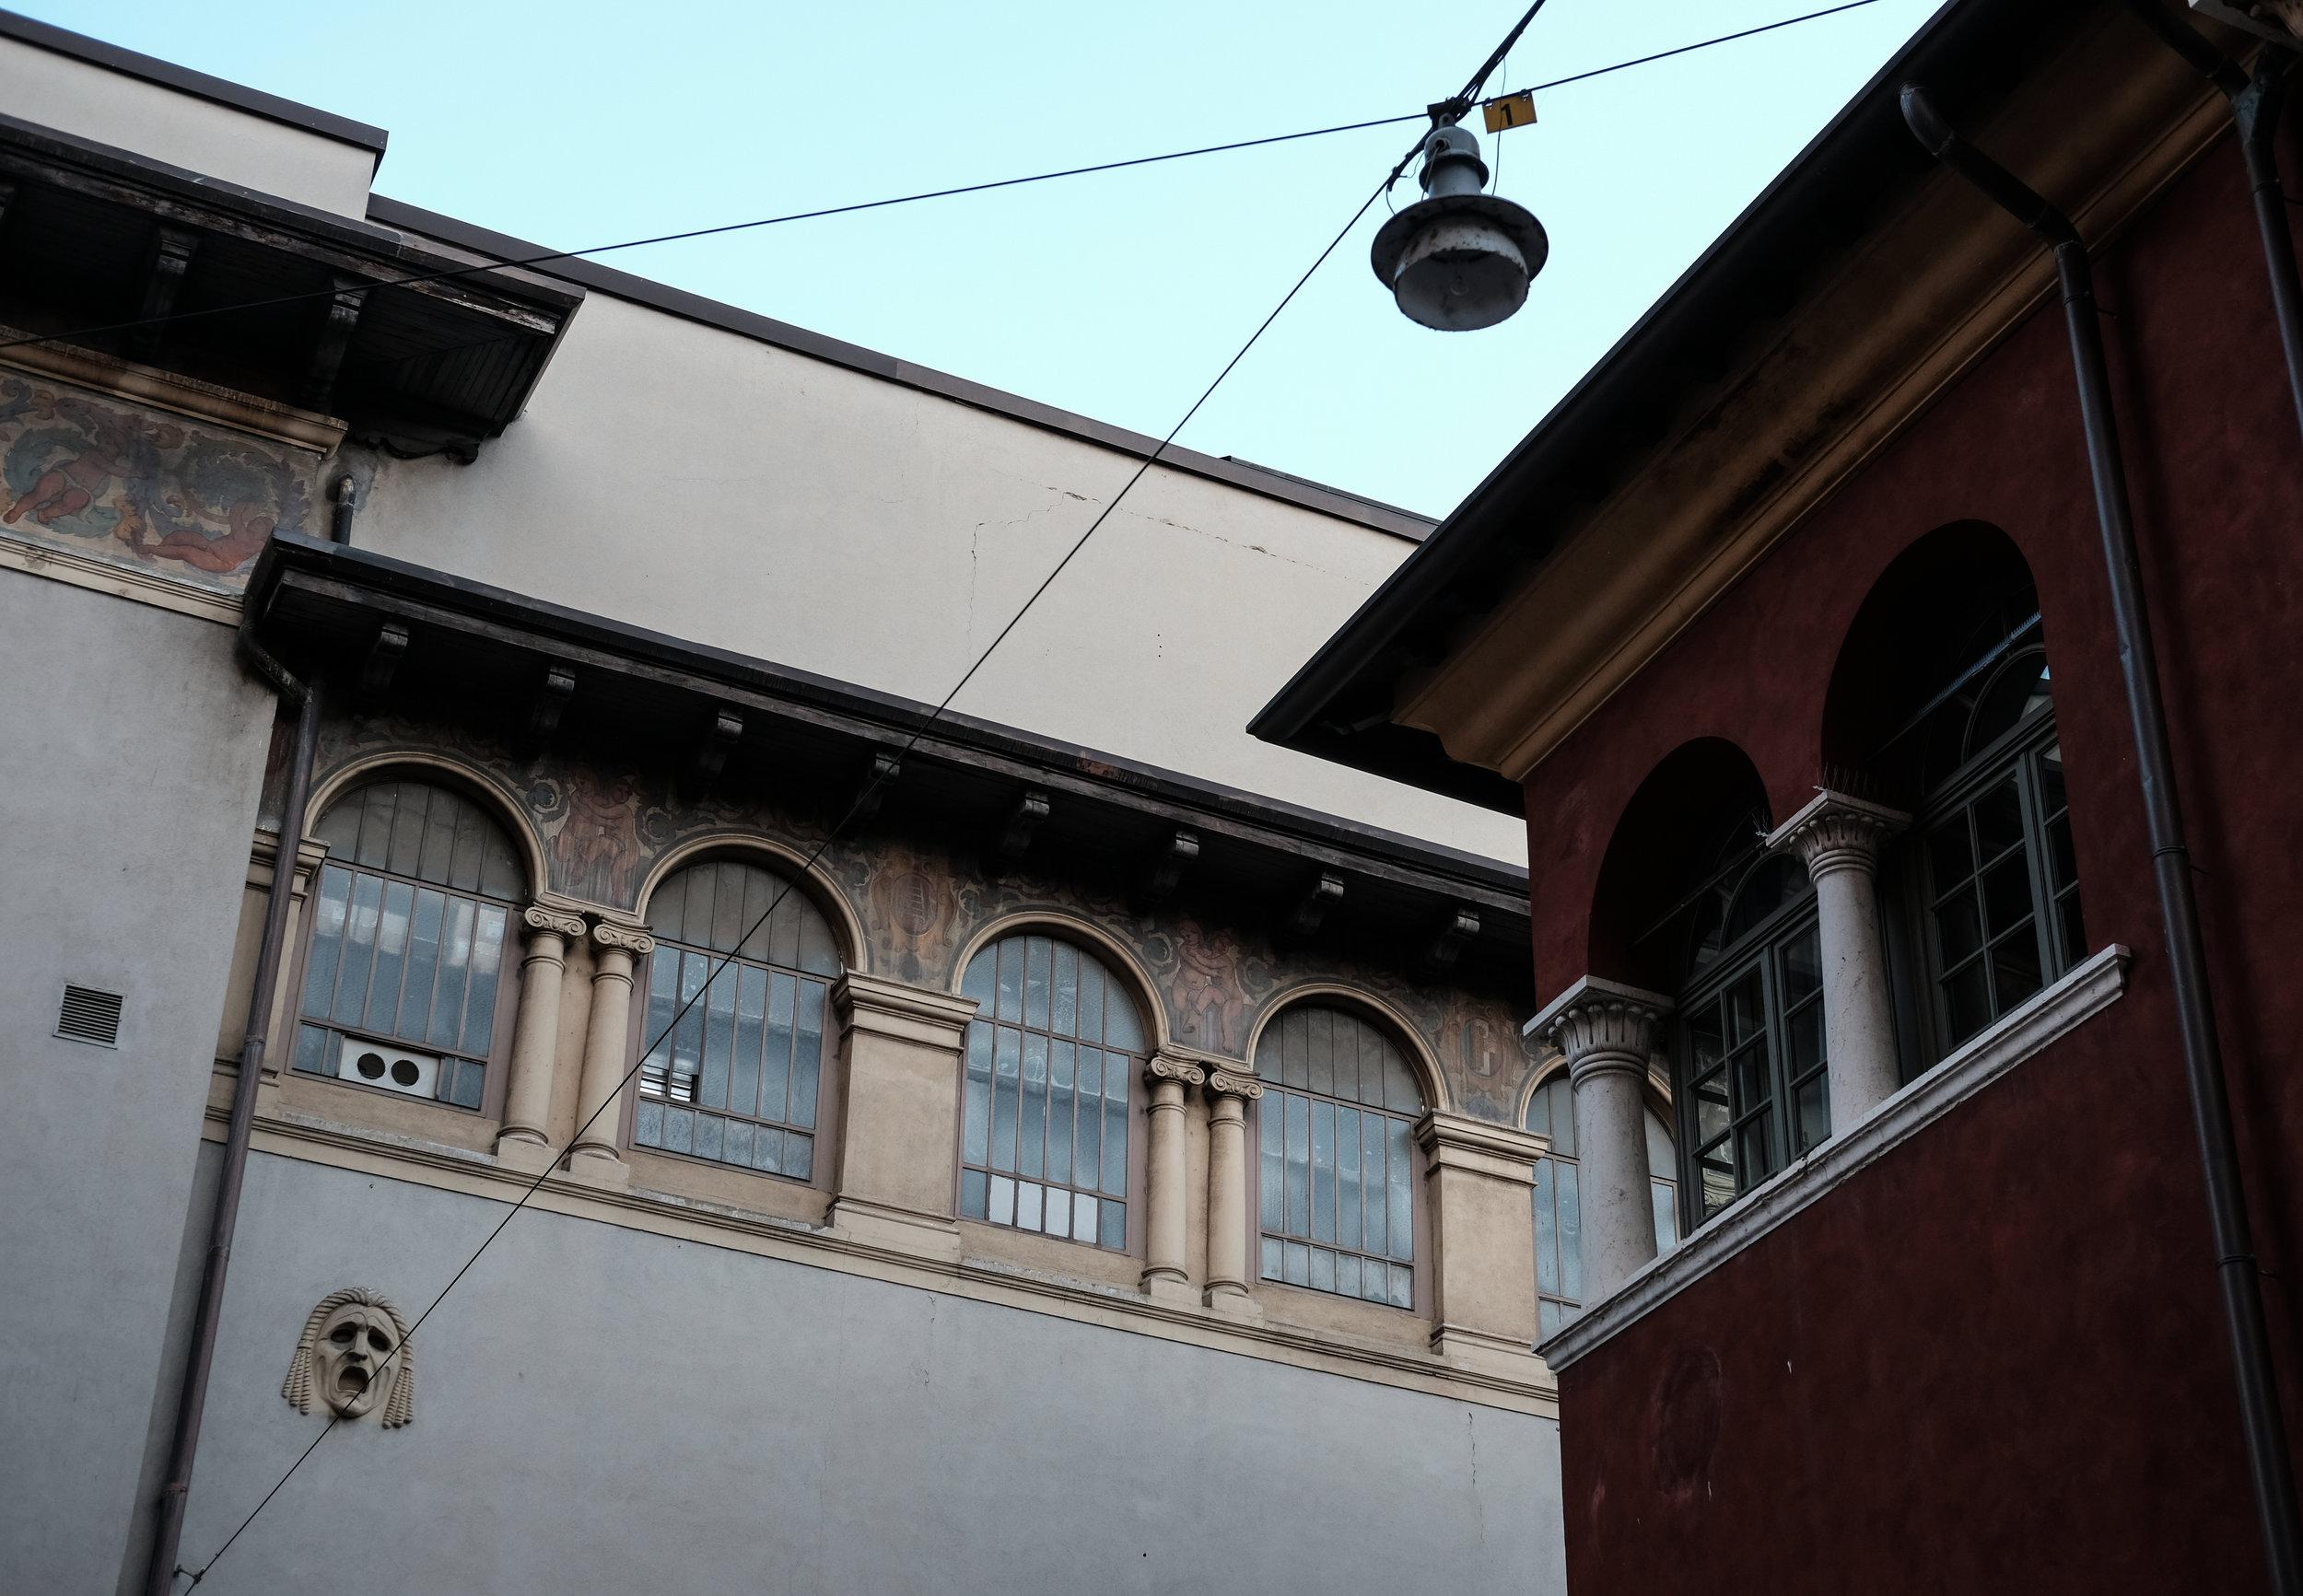 Verona, 10/7/2016, 21:31:07